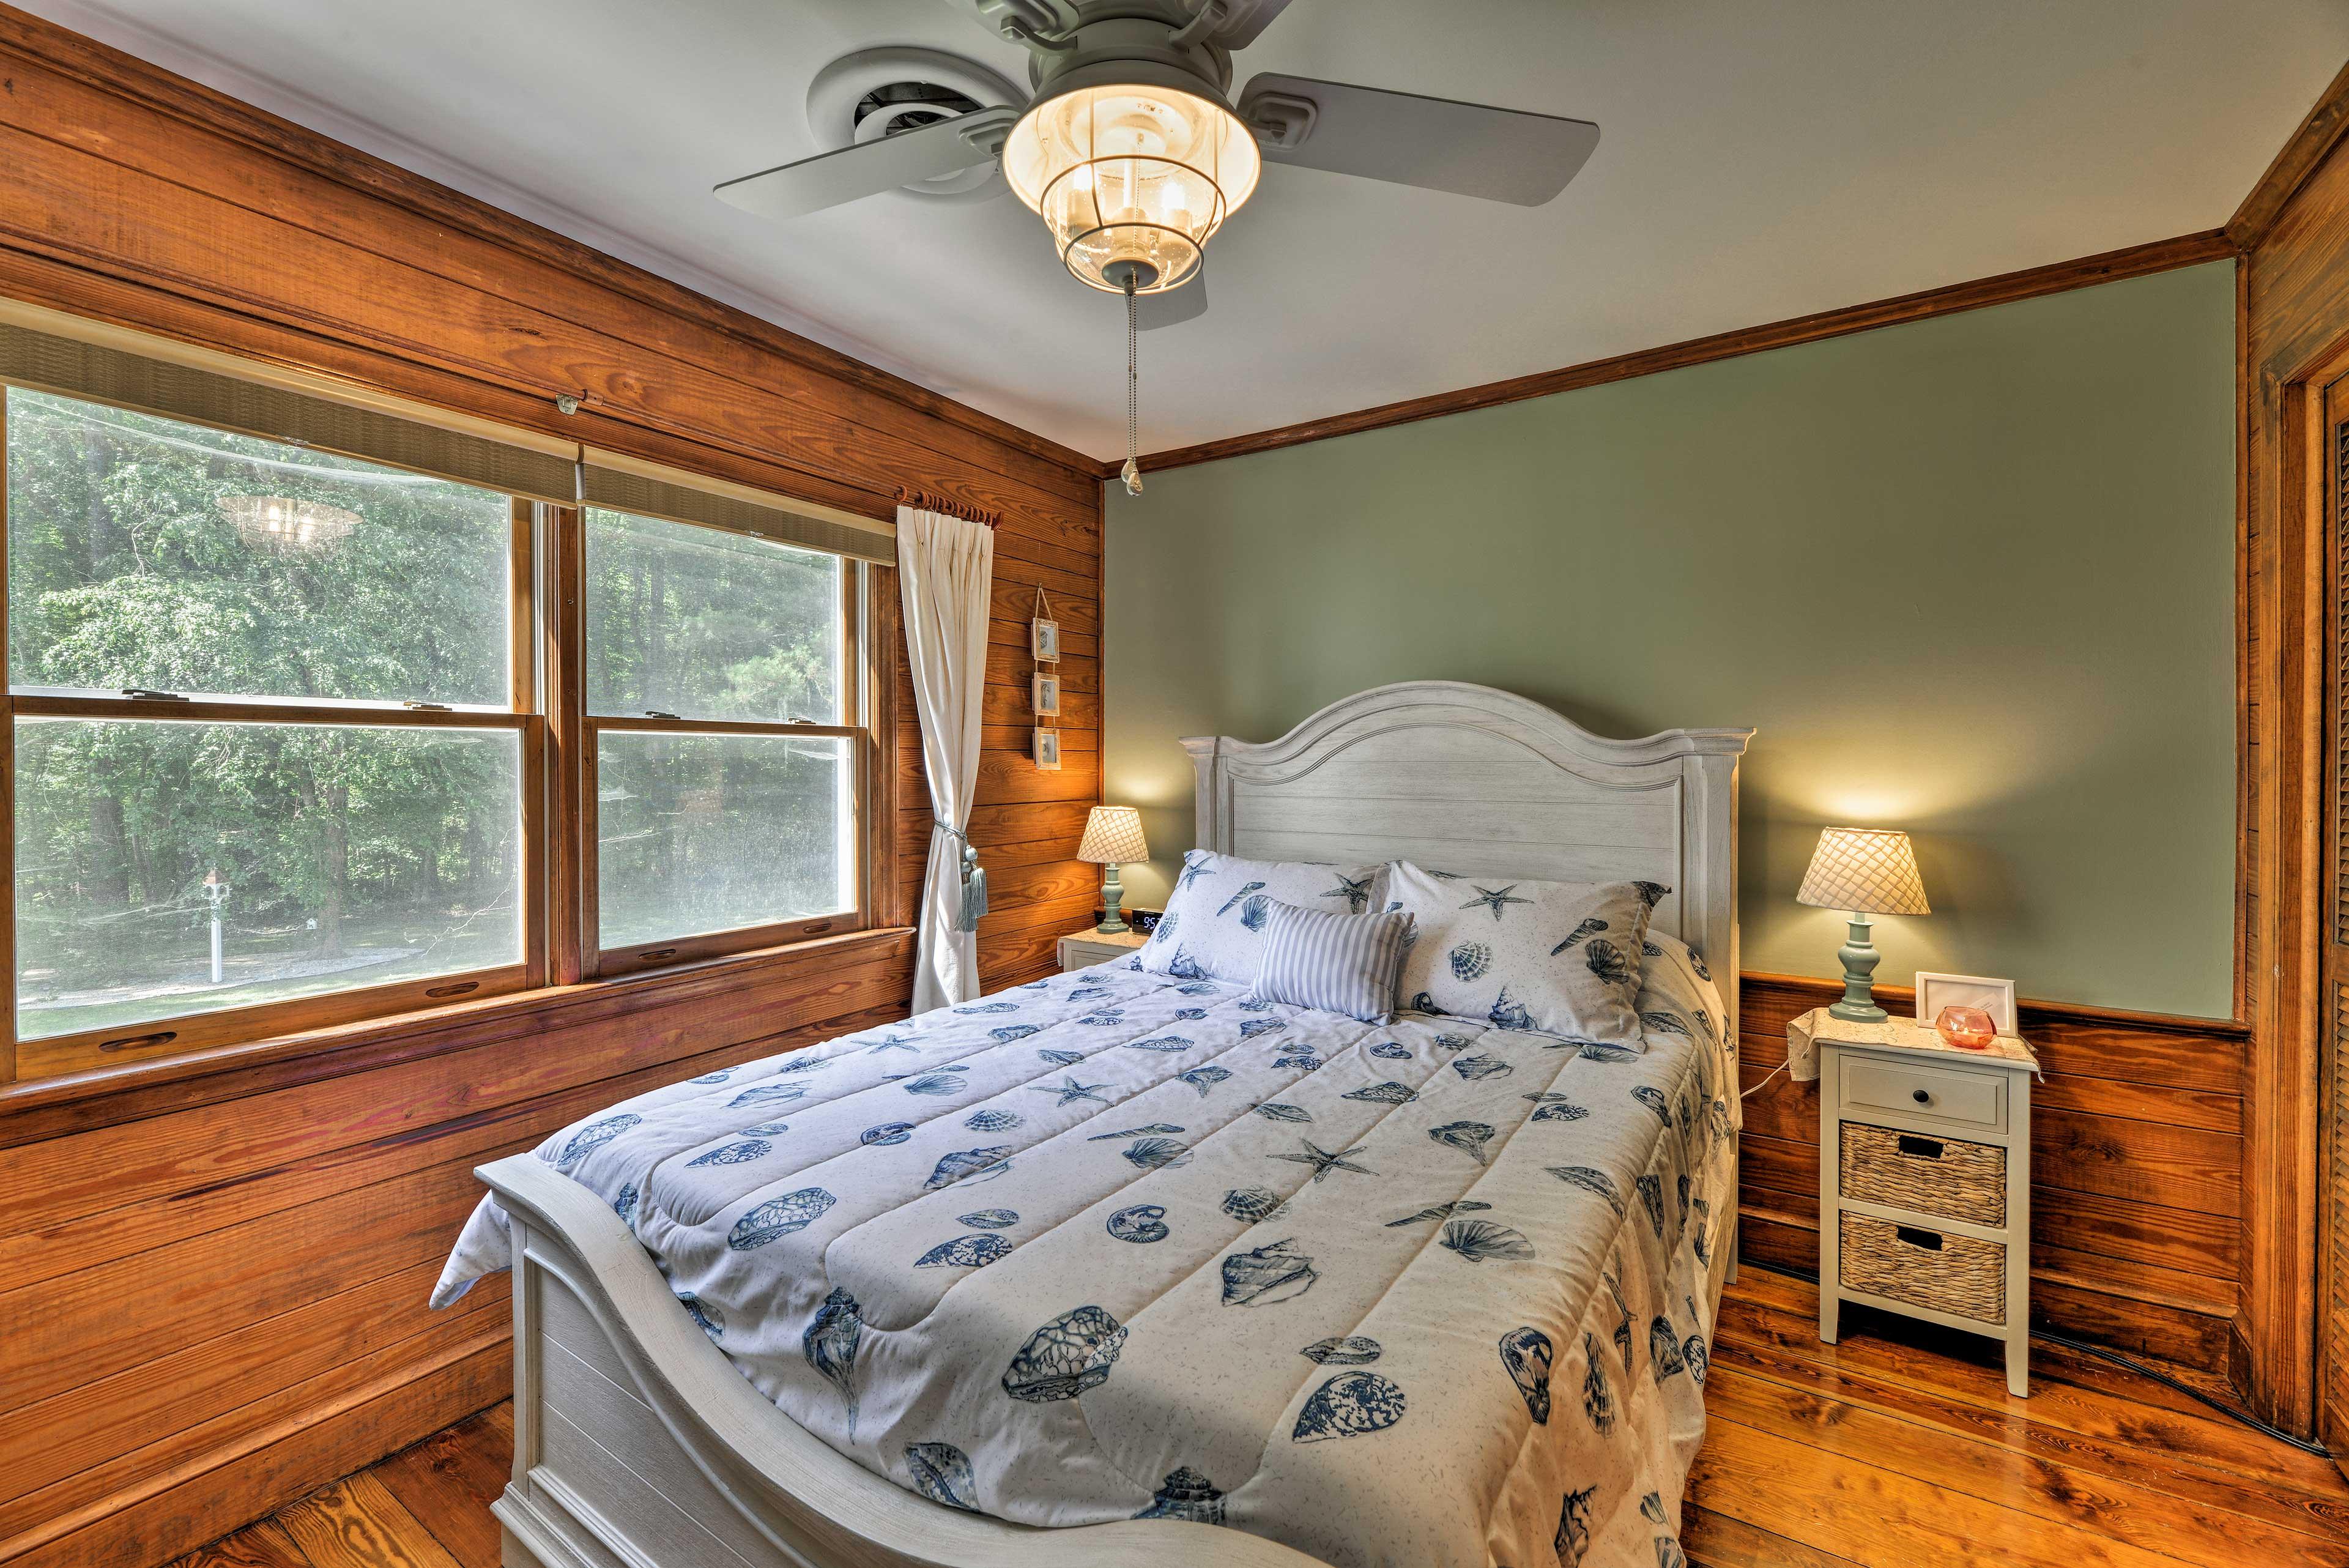 The sixth bedroom has a queen bed.